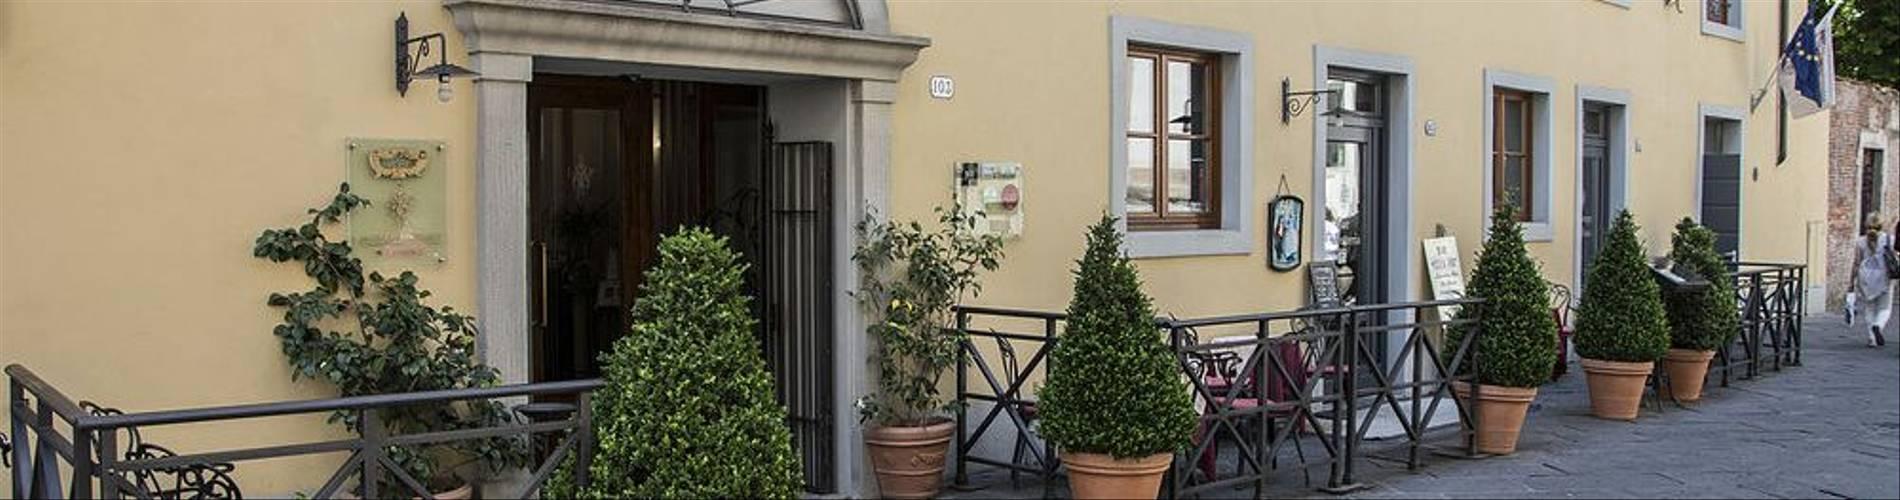 01-Hotel San Luca Palace.jpg